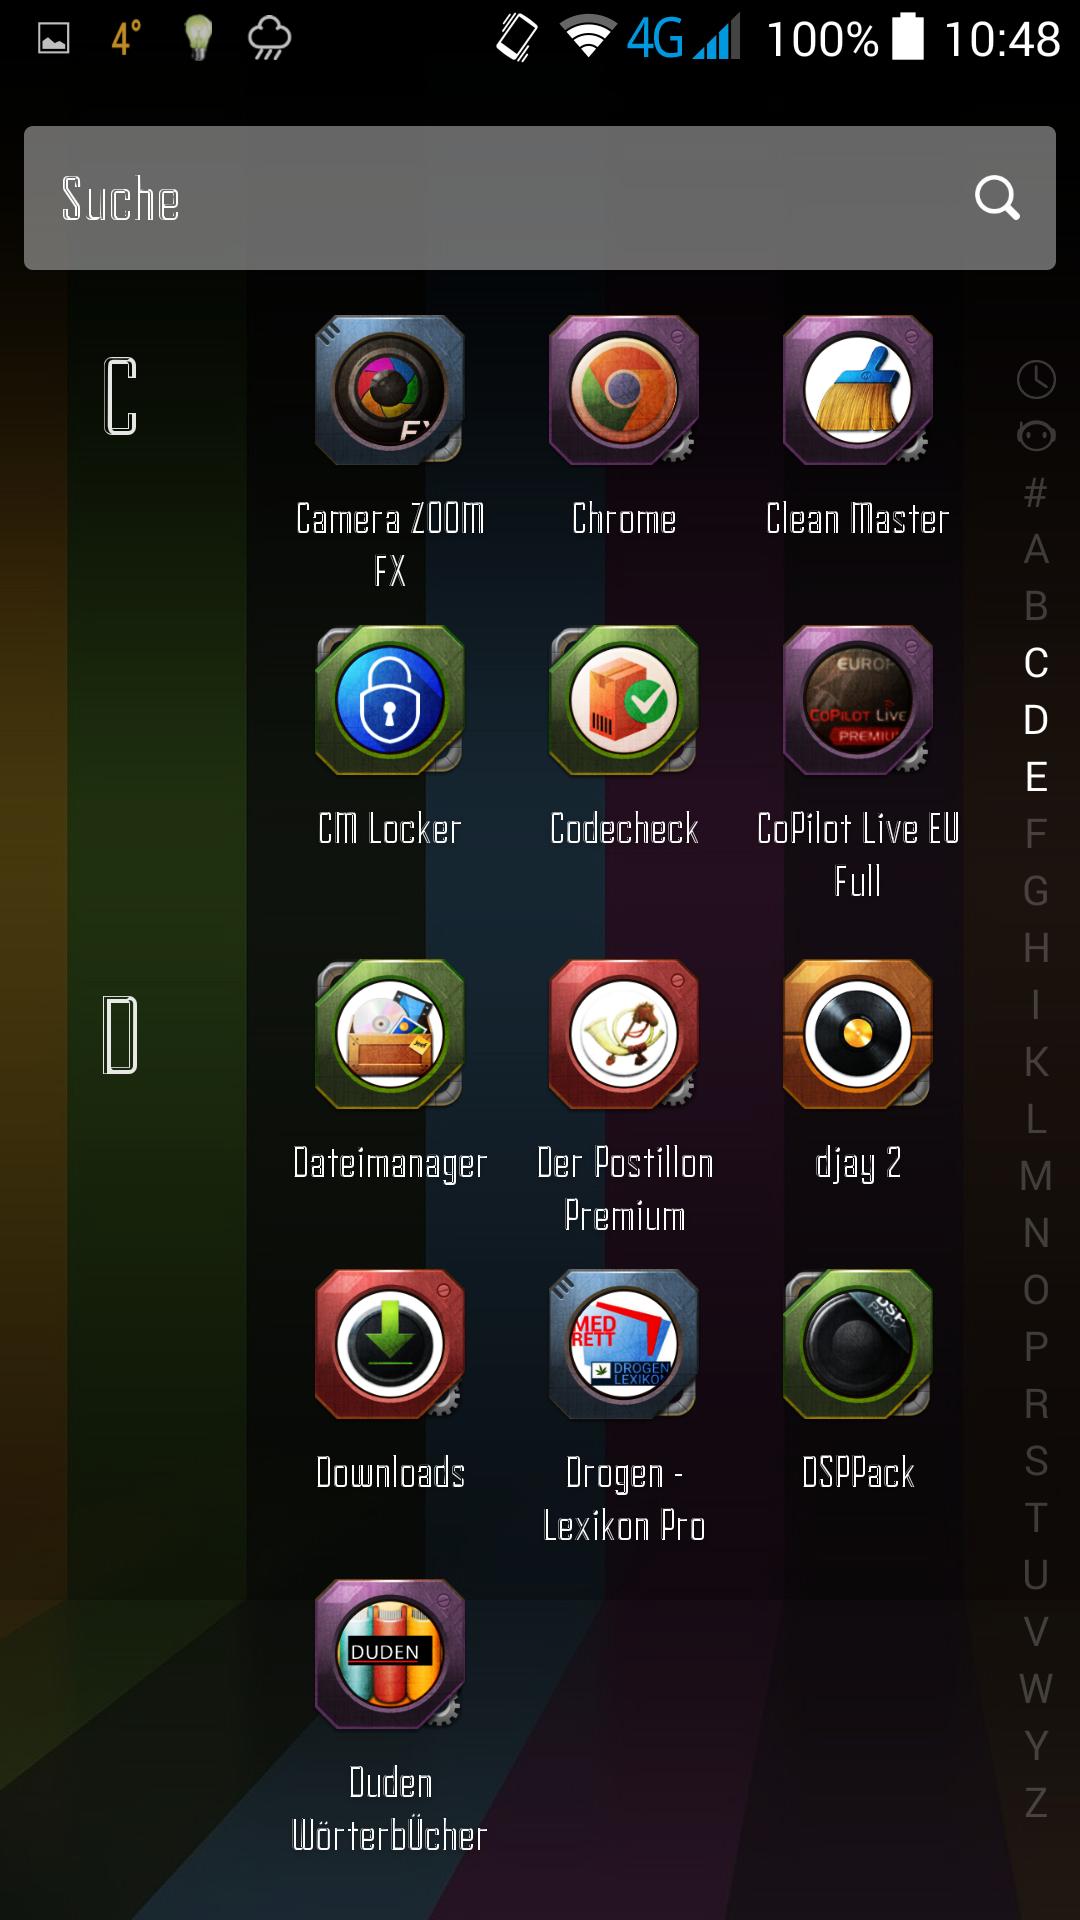 Screenshot_2015-12-17-10-48-15.png